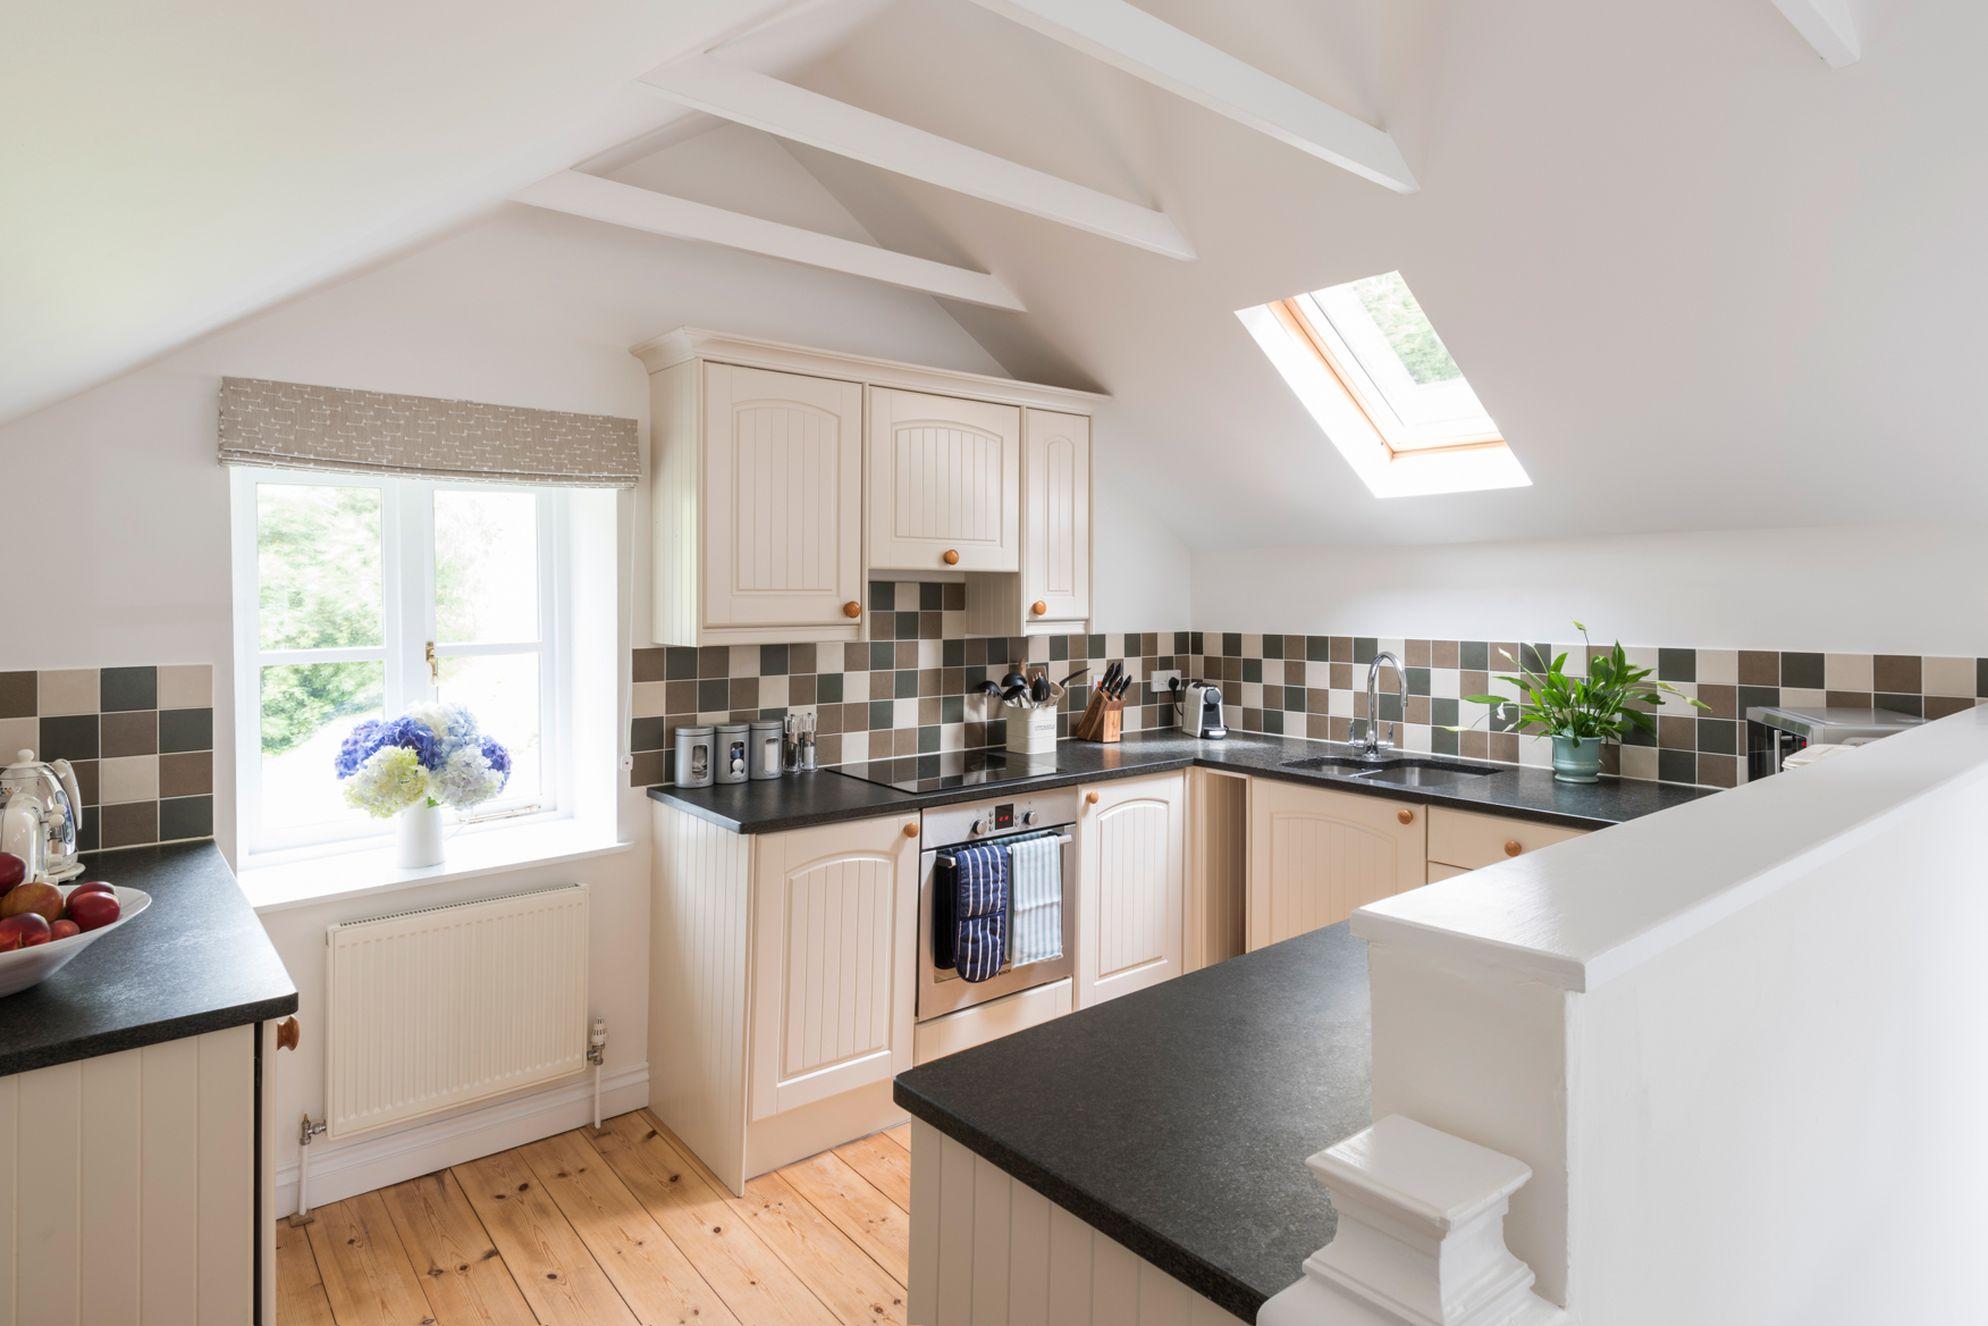 Naturally lit modern kitchen